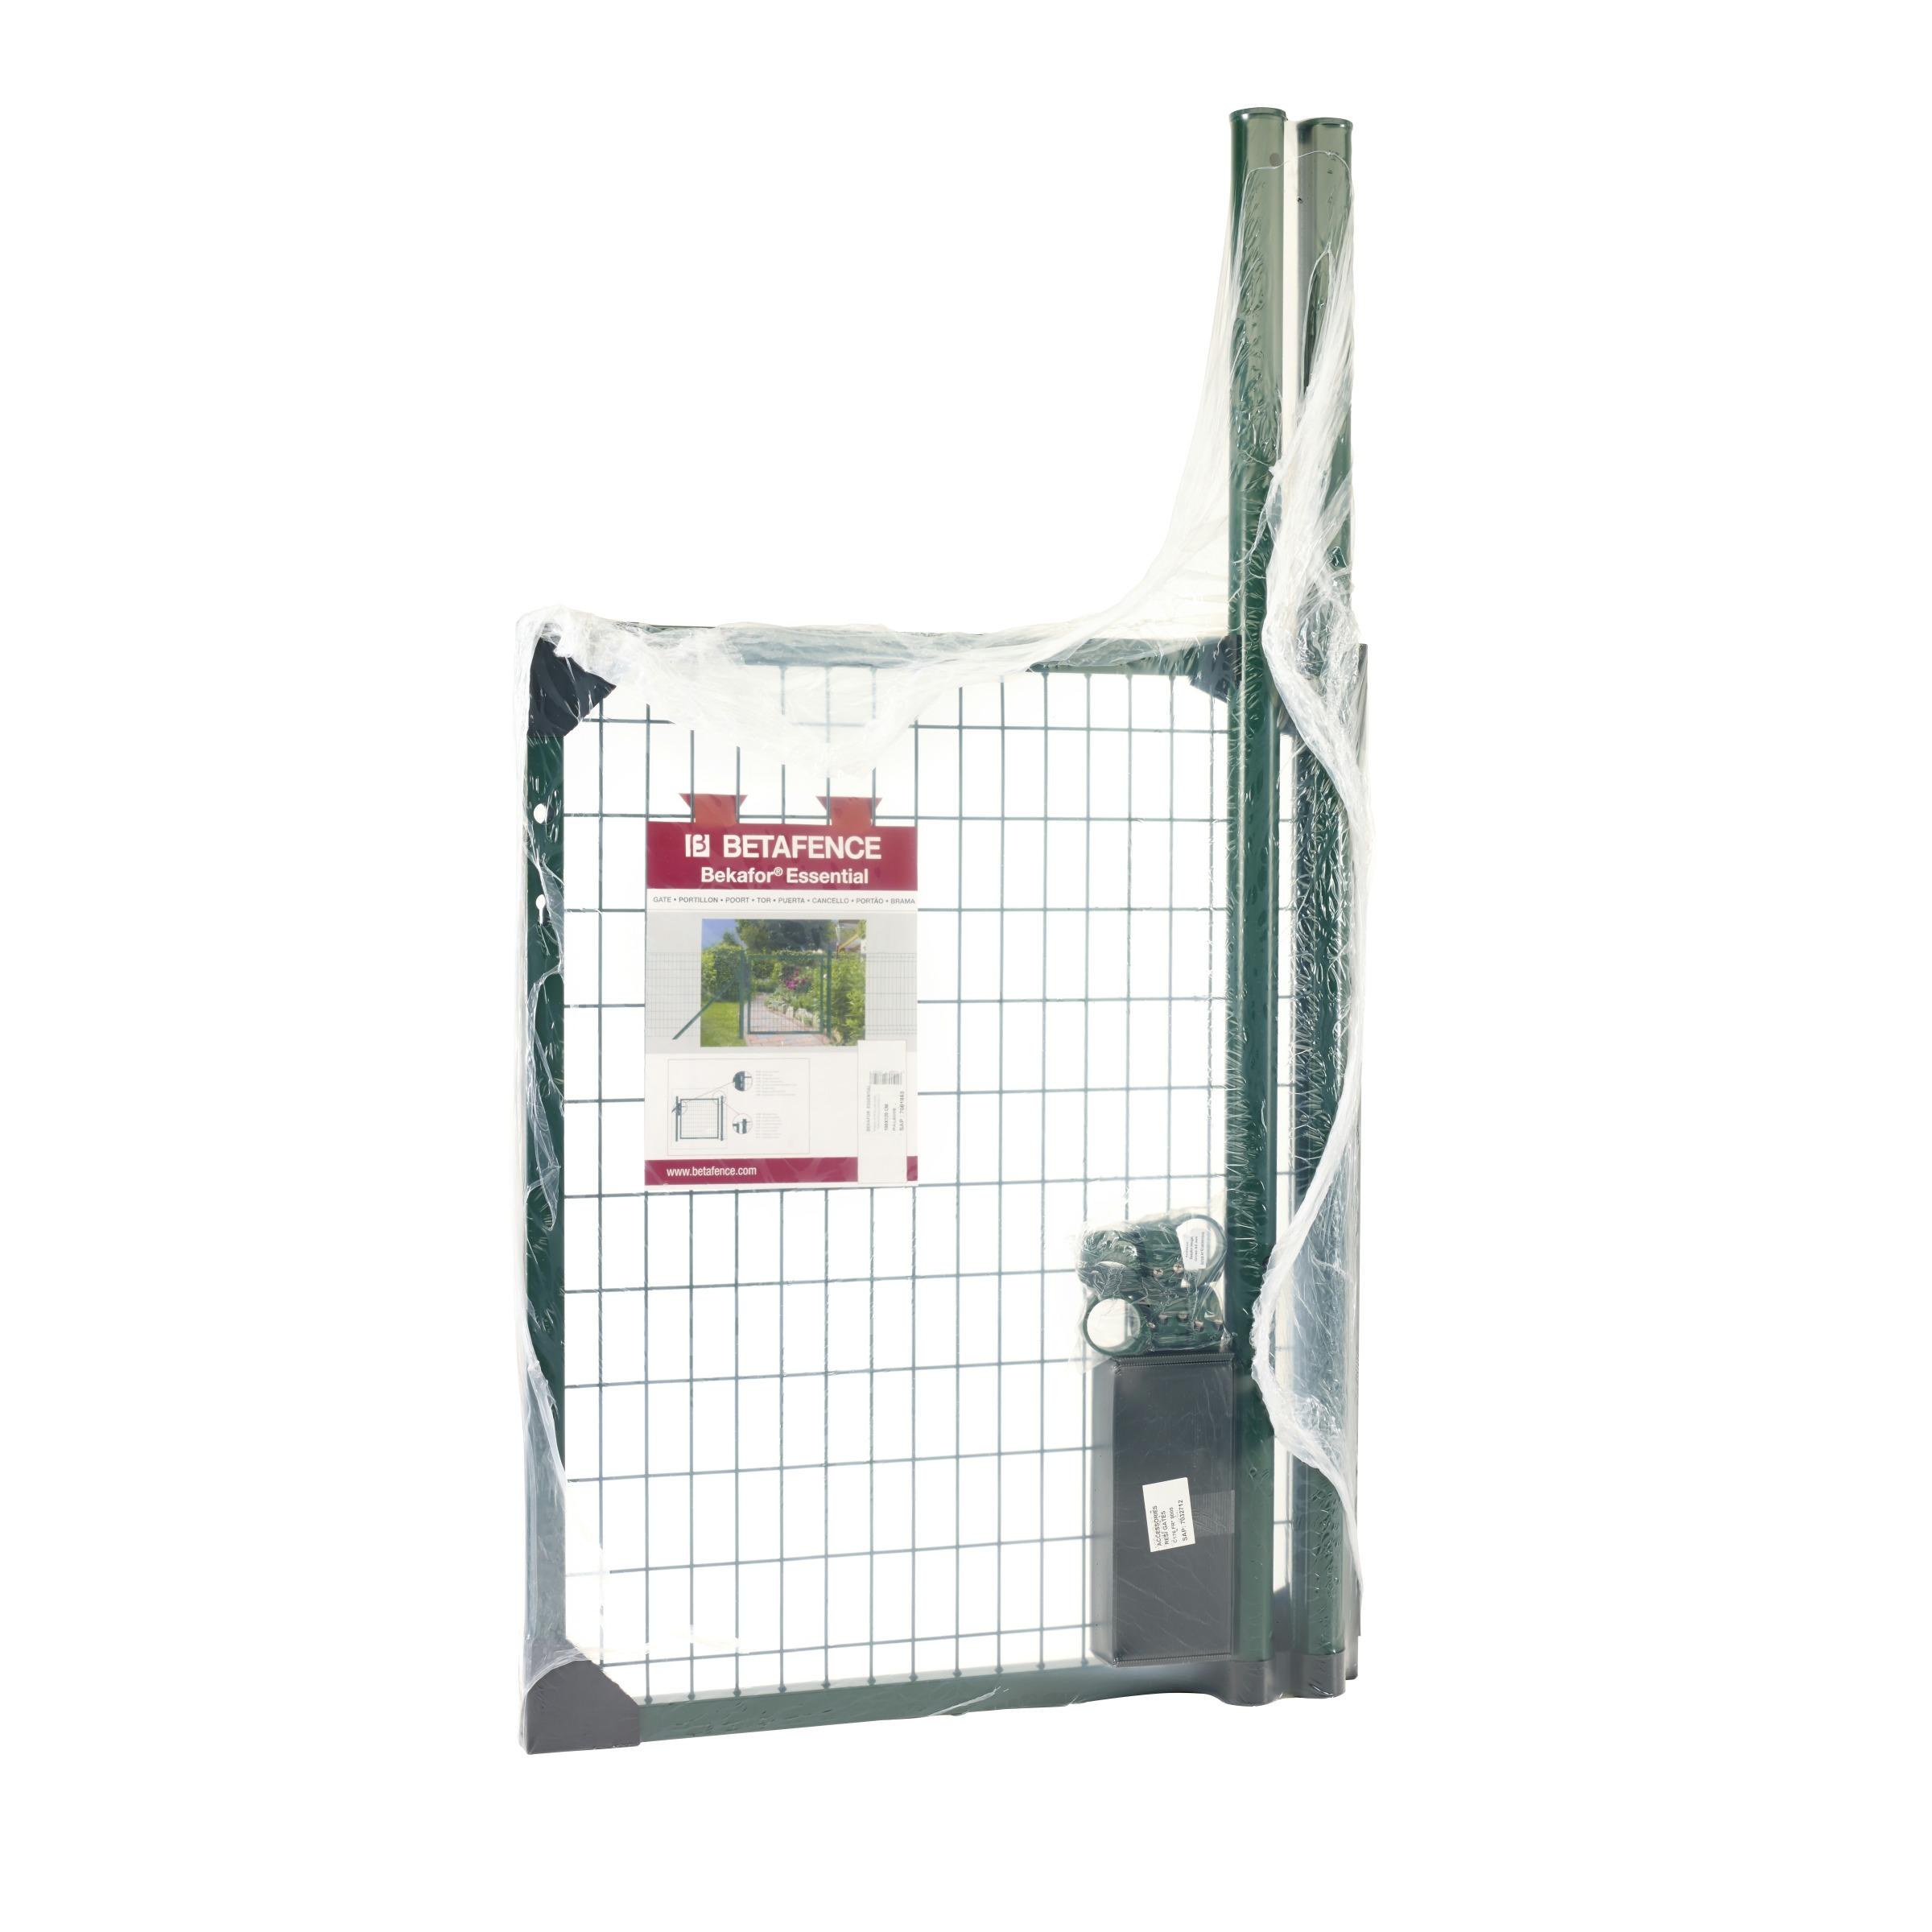 Portillon de jardin bekafor betafence 100x120 cm vert for Portillon de jardin metal vert